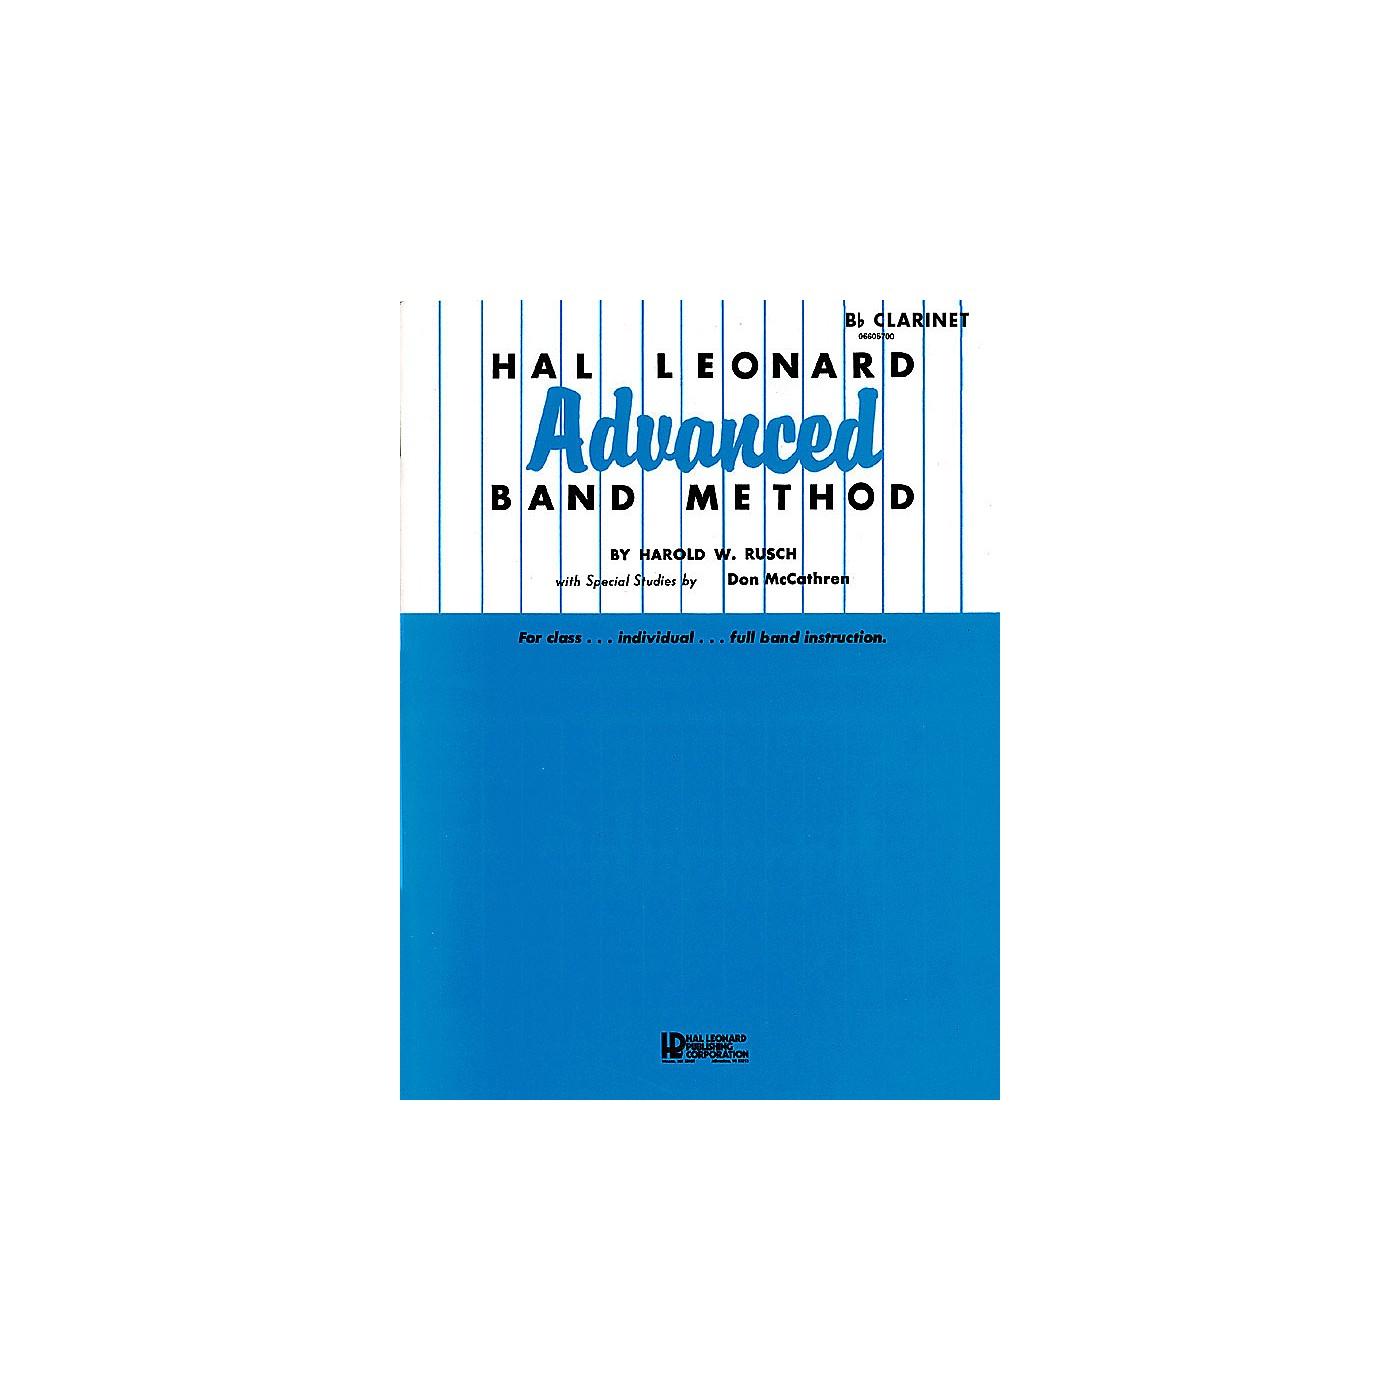 Hal Leonard Hal Leonard Advanced Band Method (B-flat Tenor Saxophone) Advanced Band Method Series by Harold W. Rusch thumbnail